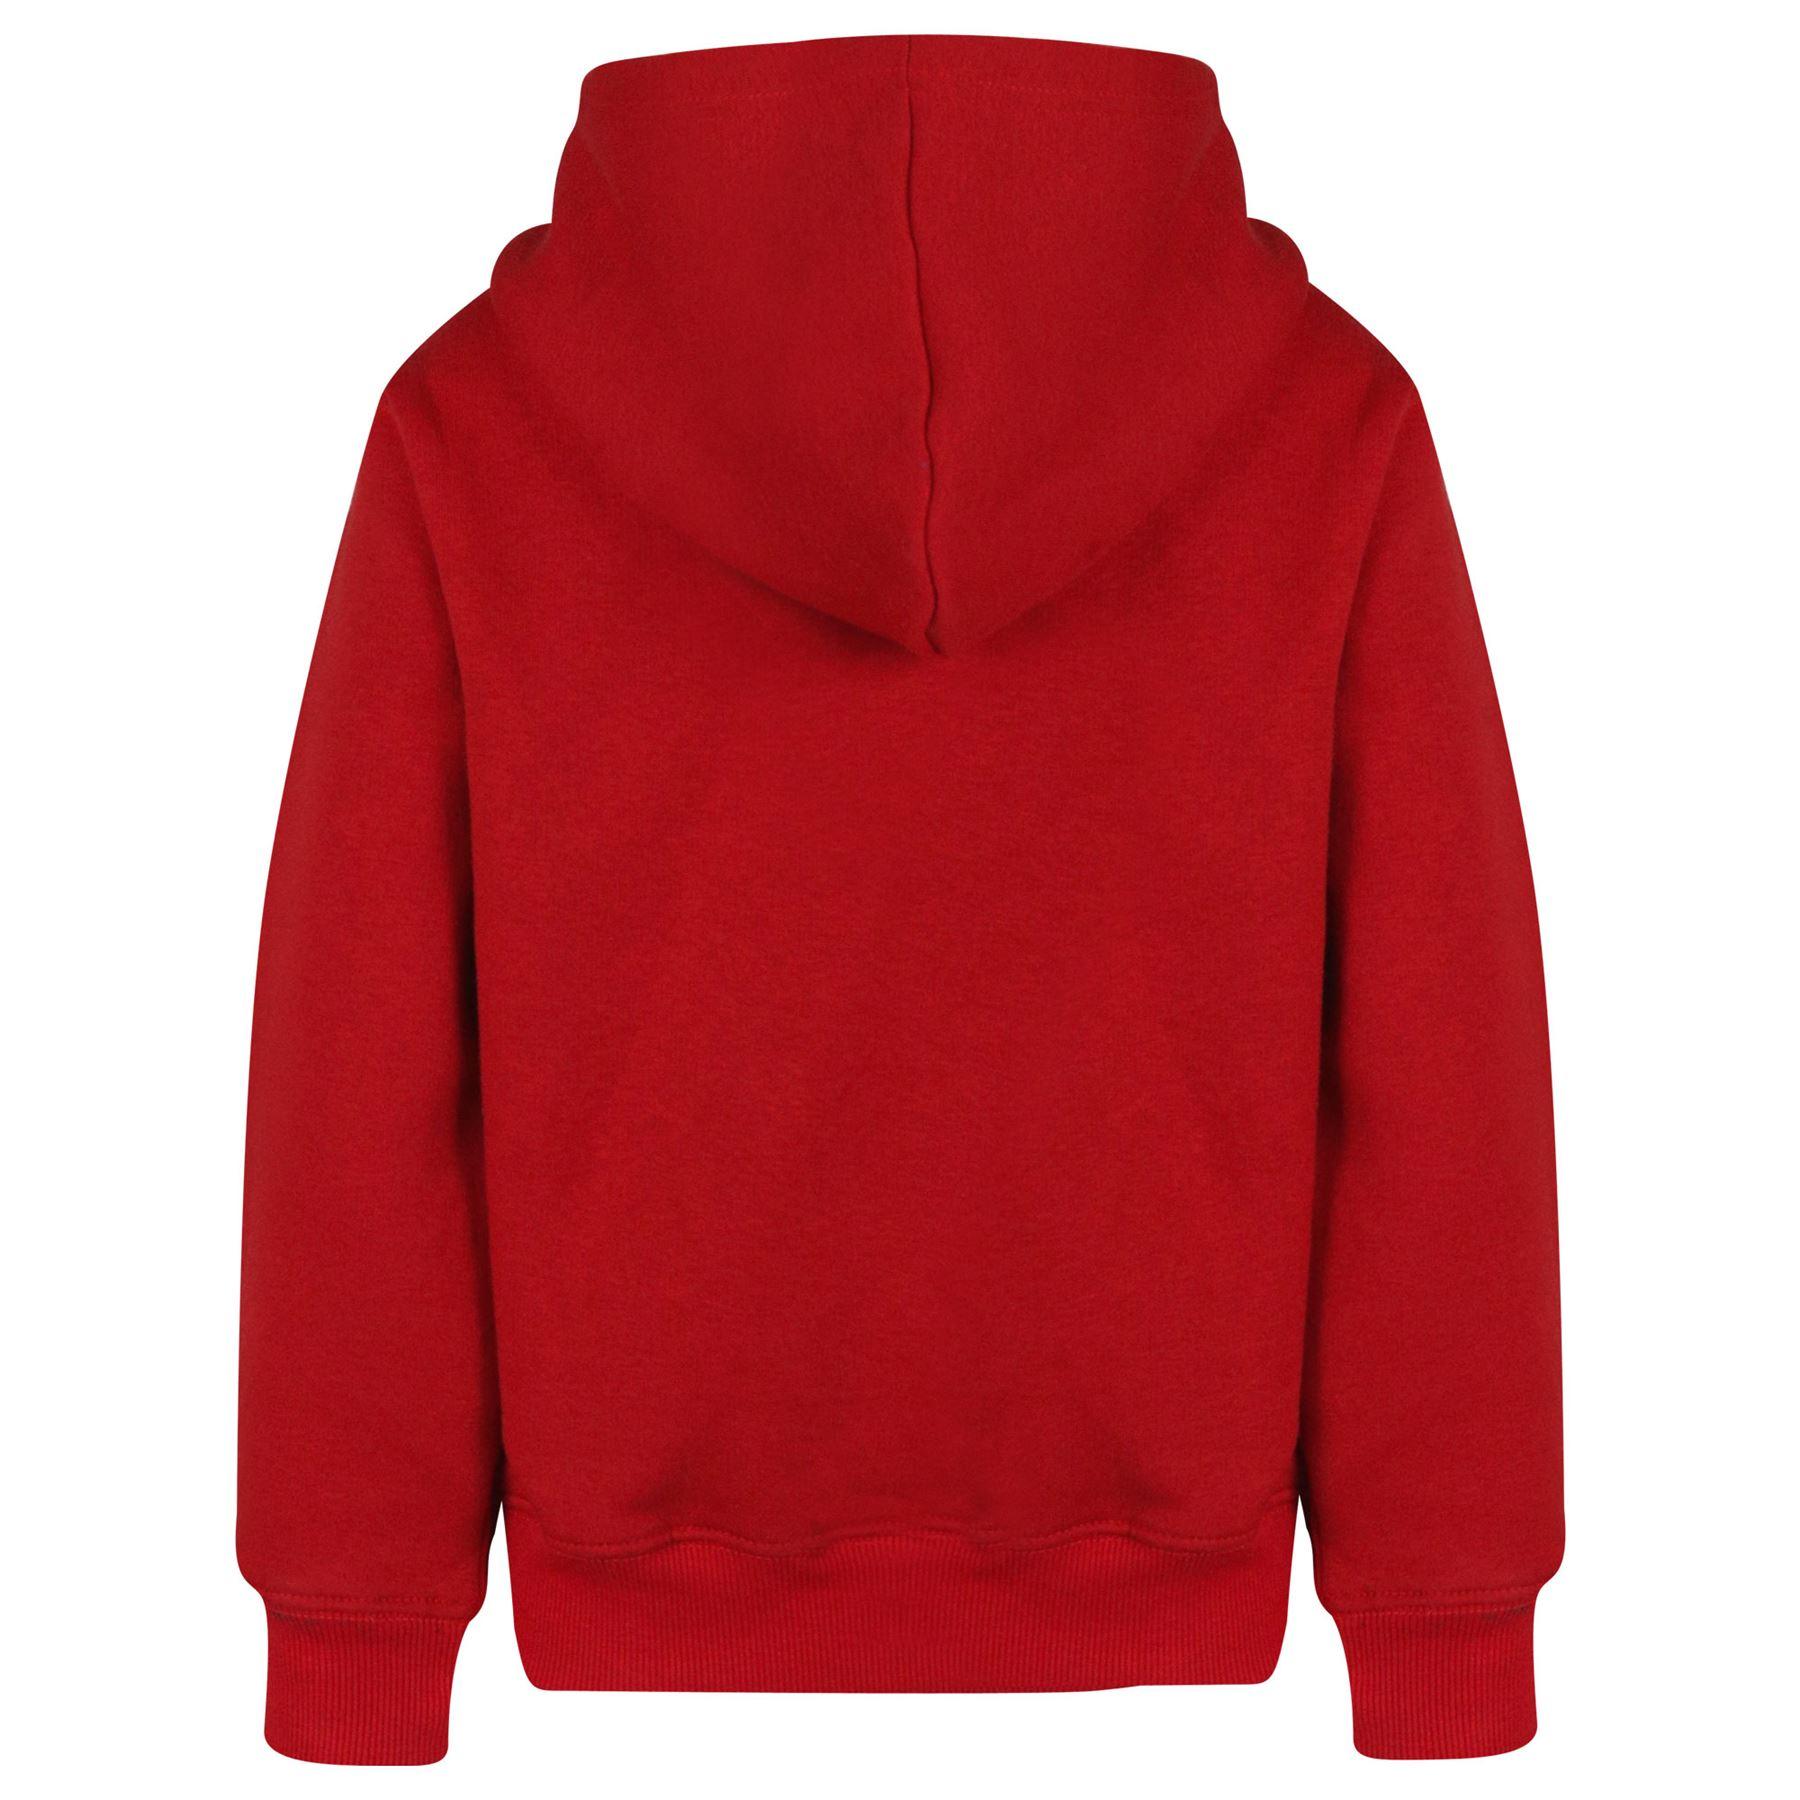 Kids Girls Boys Sweat Shirts Tops #Selfie Hooded Jumpers Hoodies New Age 2-13 Yr